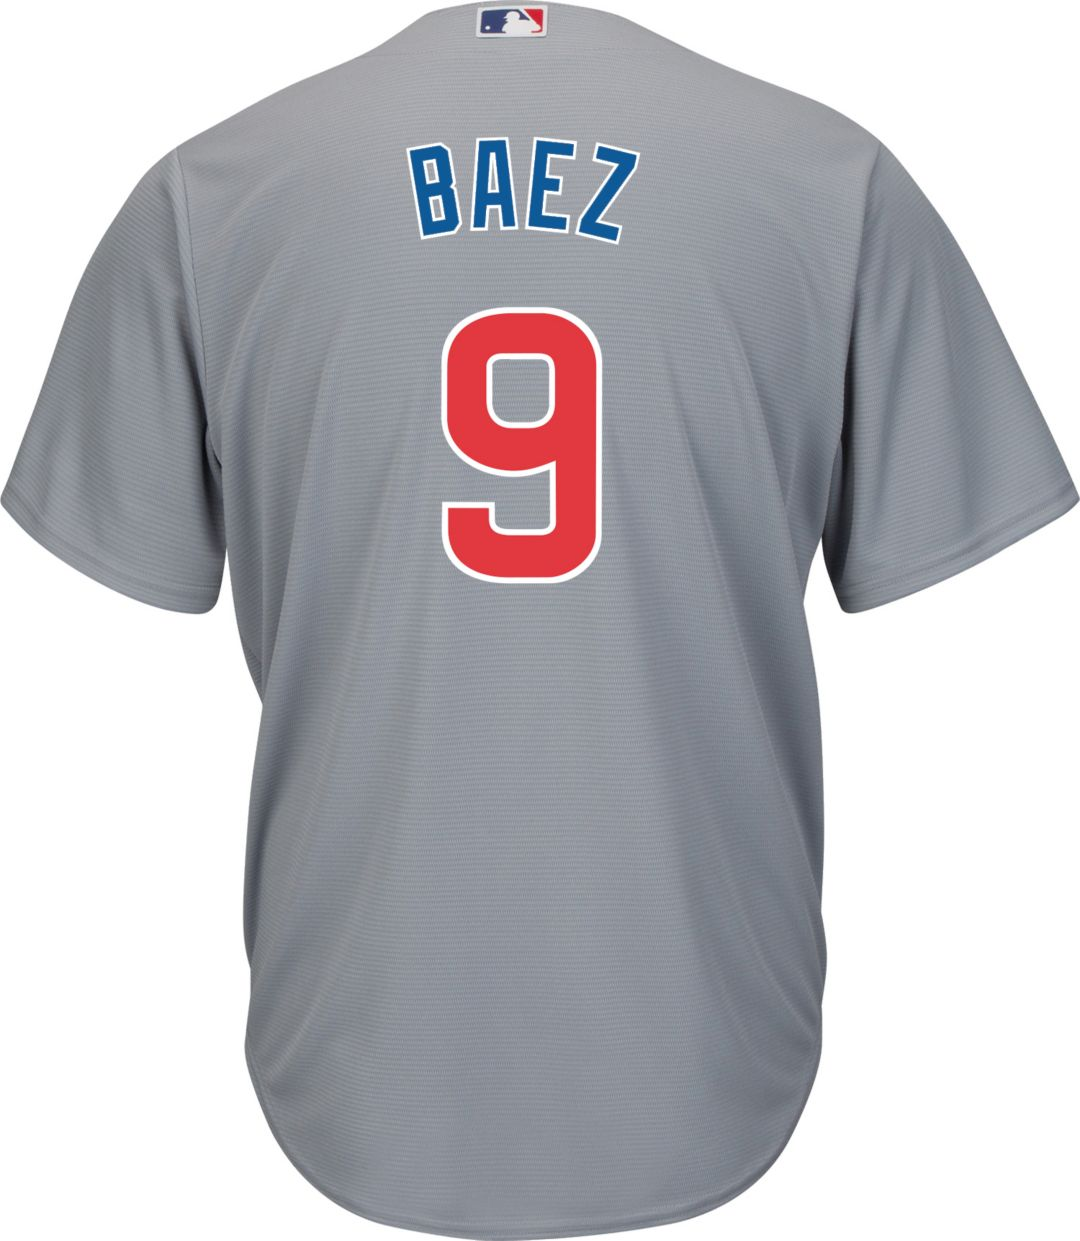 9743823f Majestic Men's Replica Chicago Cubs Javier Baez #9 Cool Base Road Grey  Jersey. noImageFound. Previous. 1. 2. 3